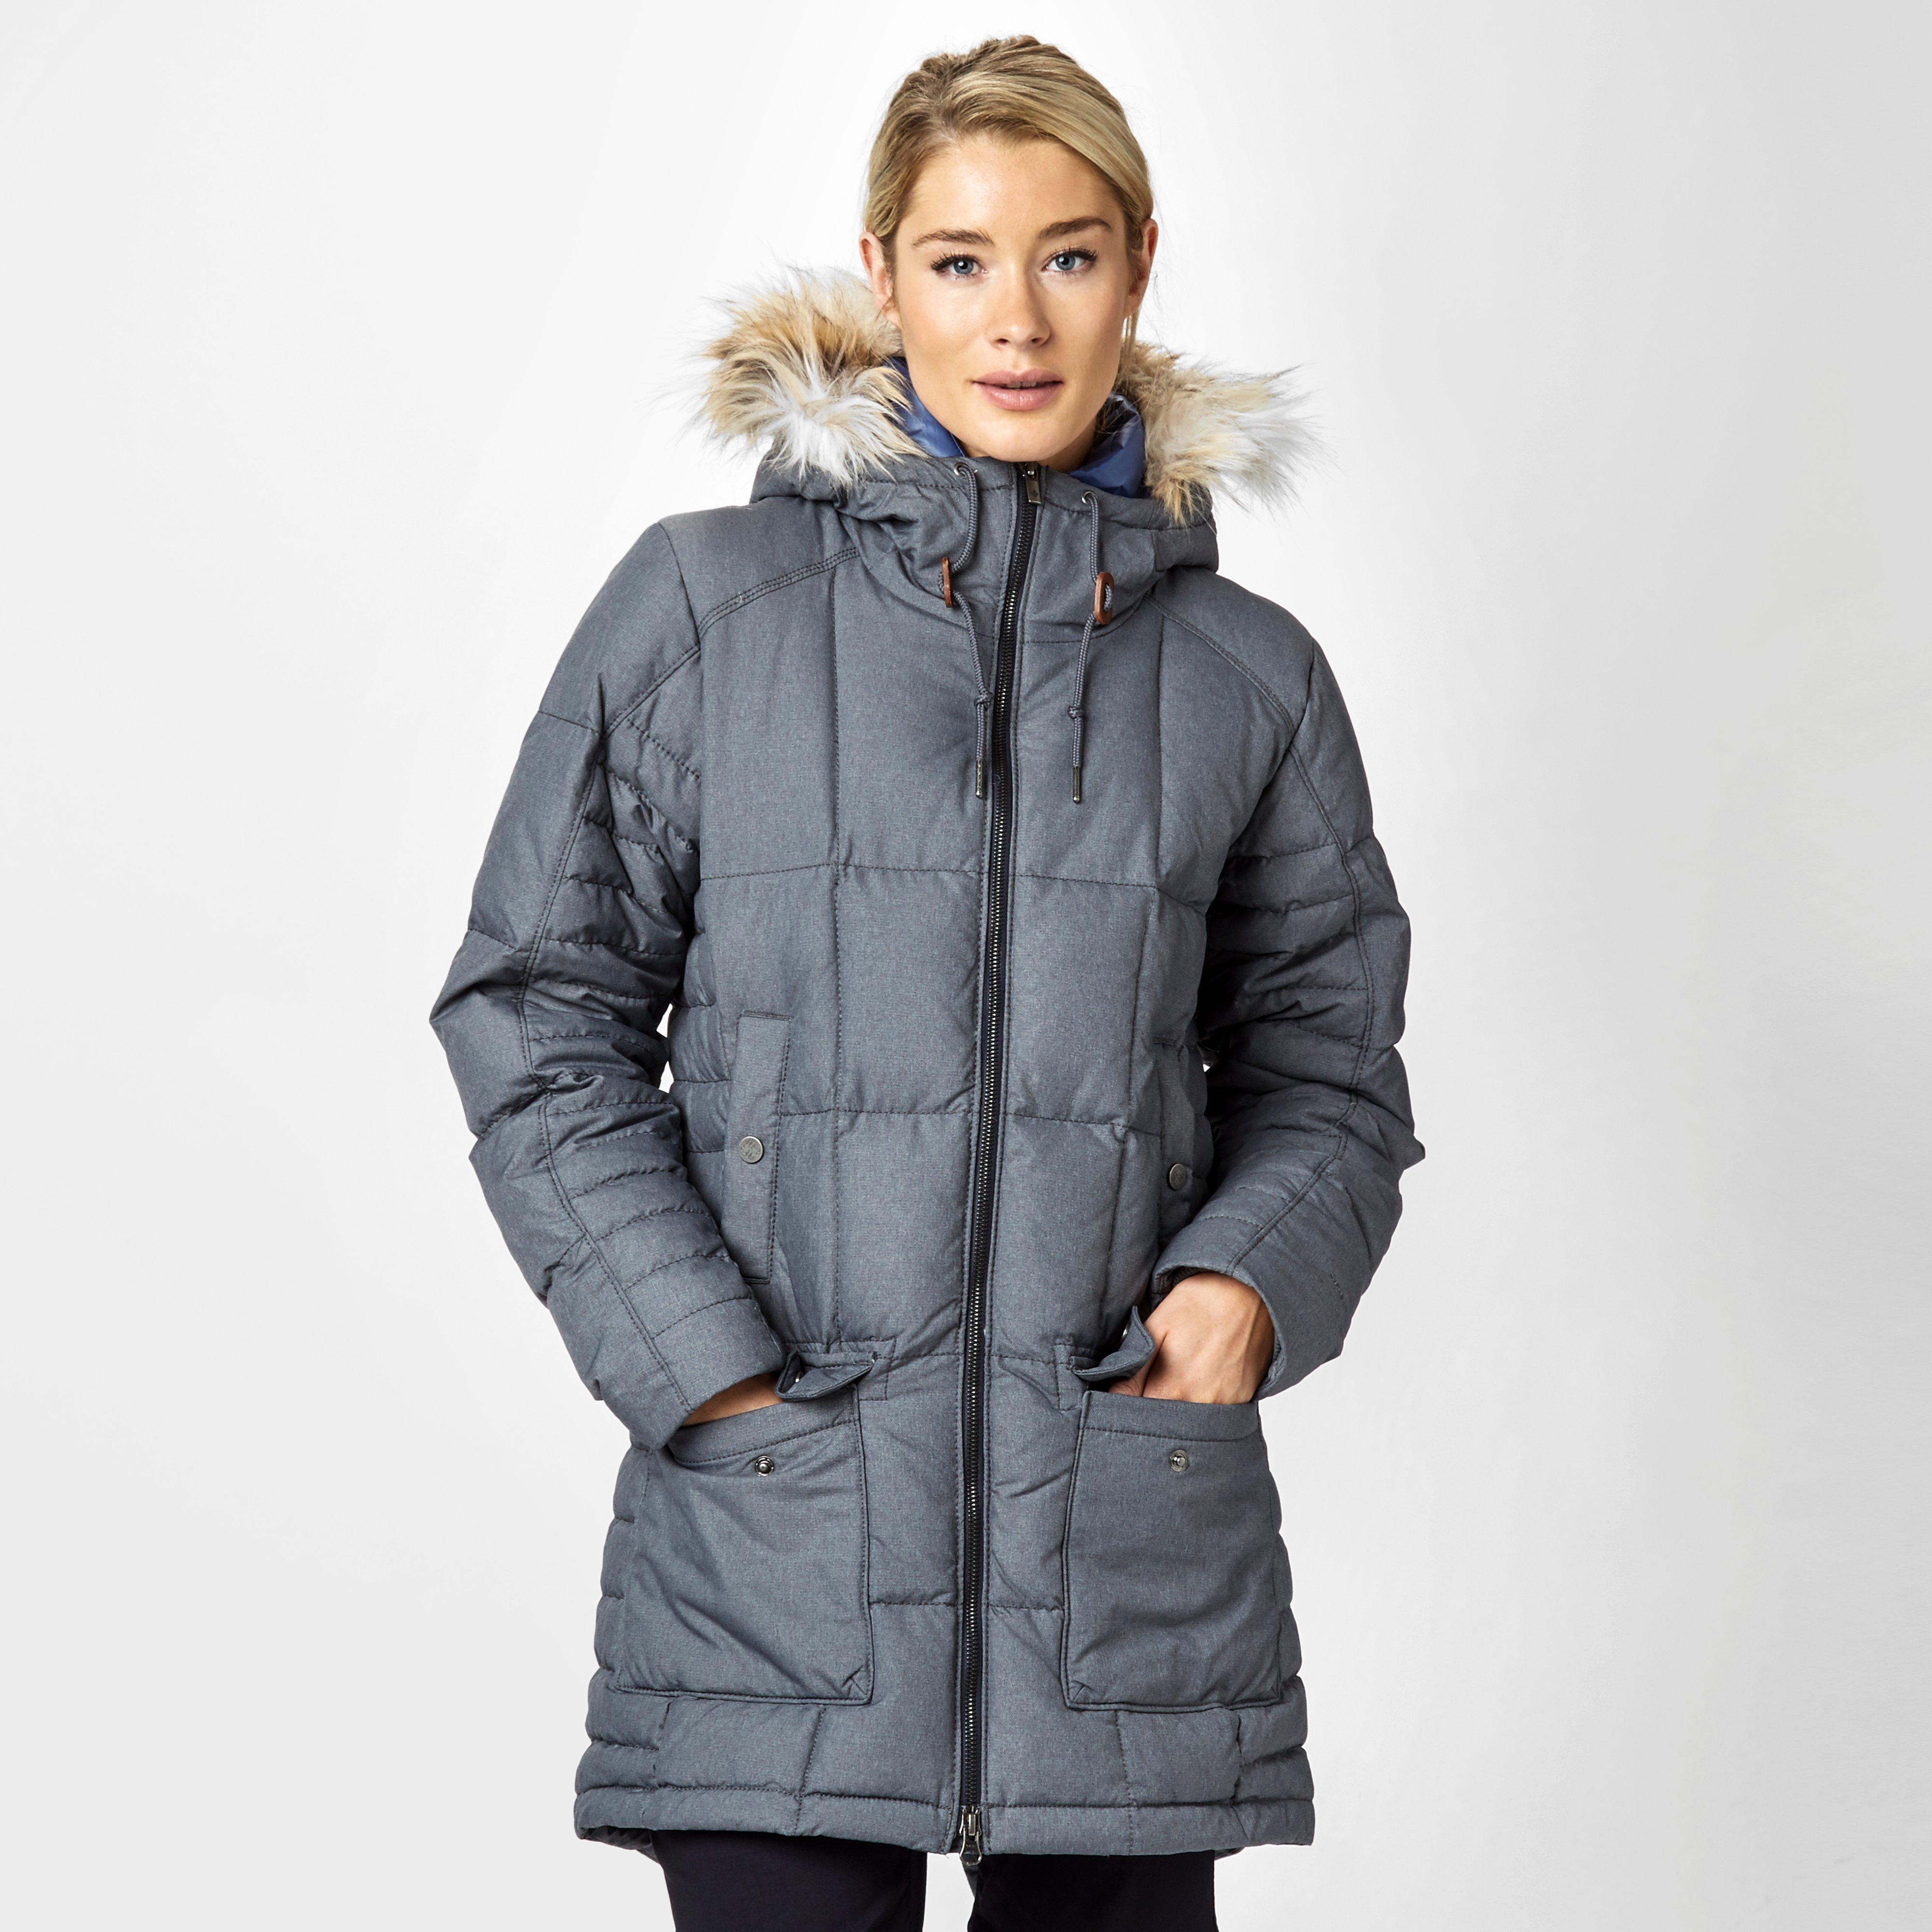 Columbia Women's Della Fall Parka Jacket, Grey | Bear Grylls UK ...